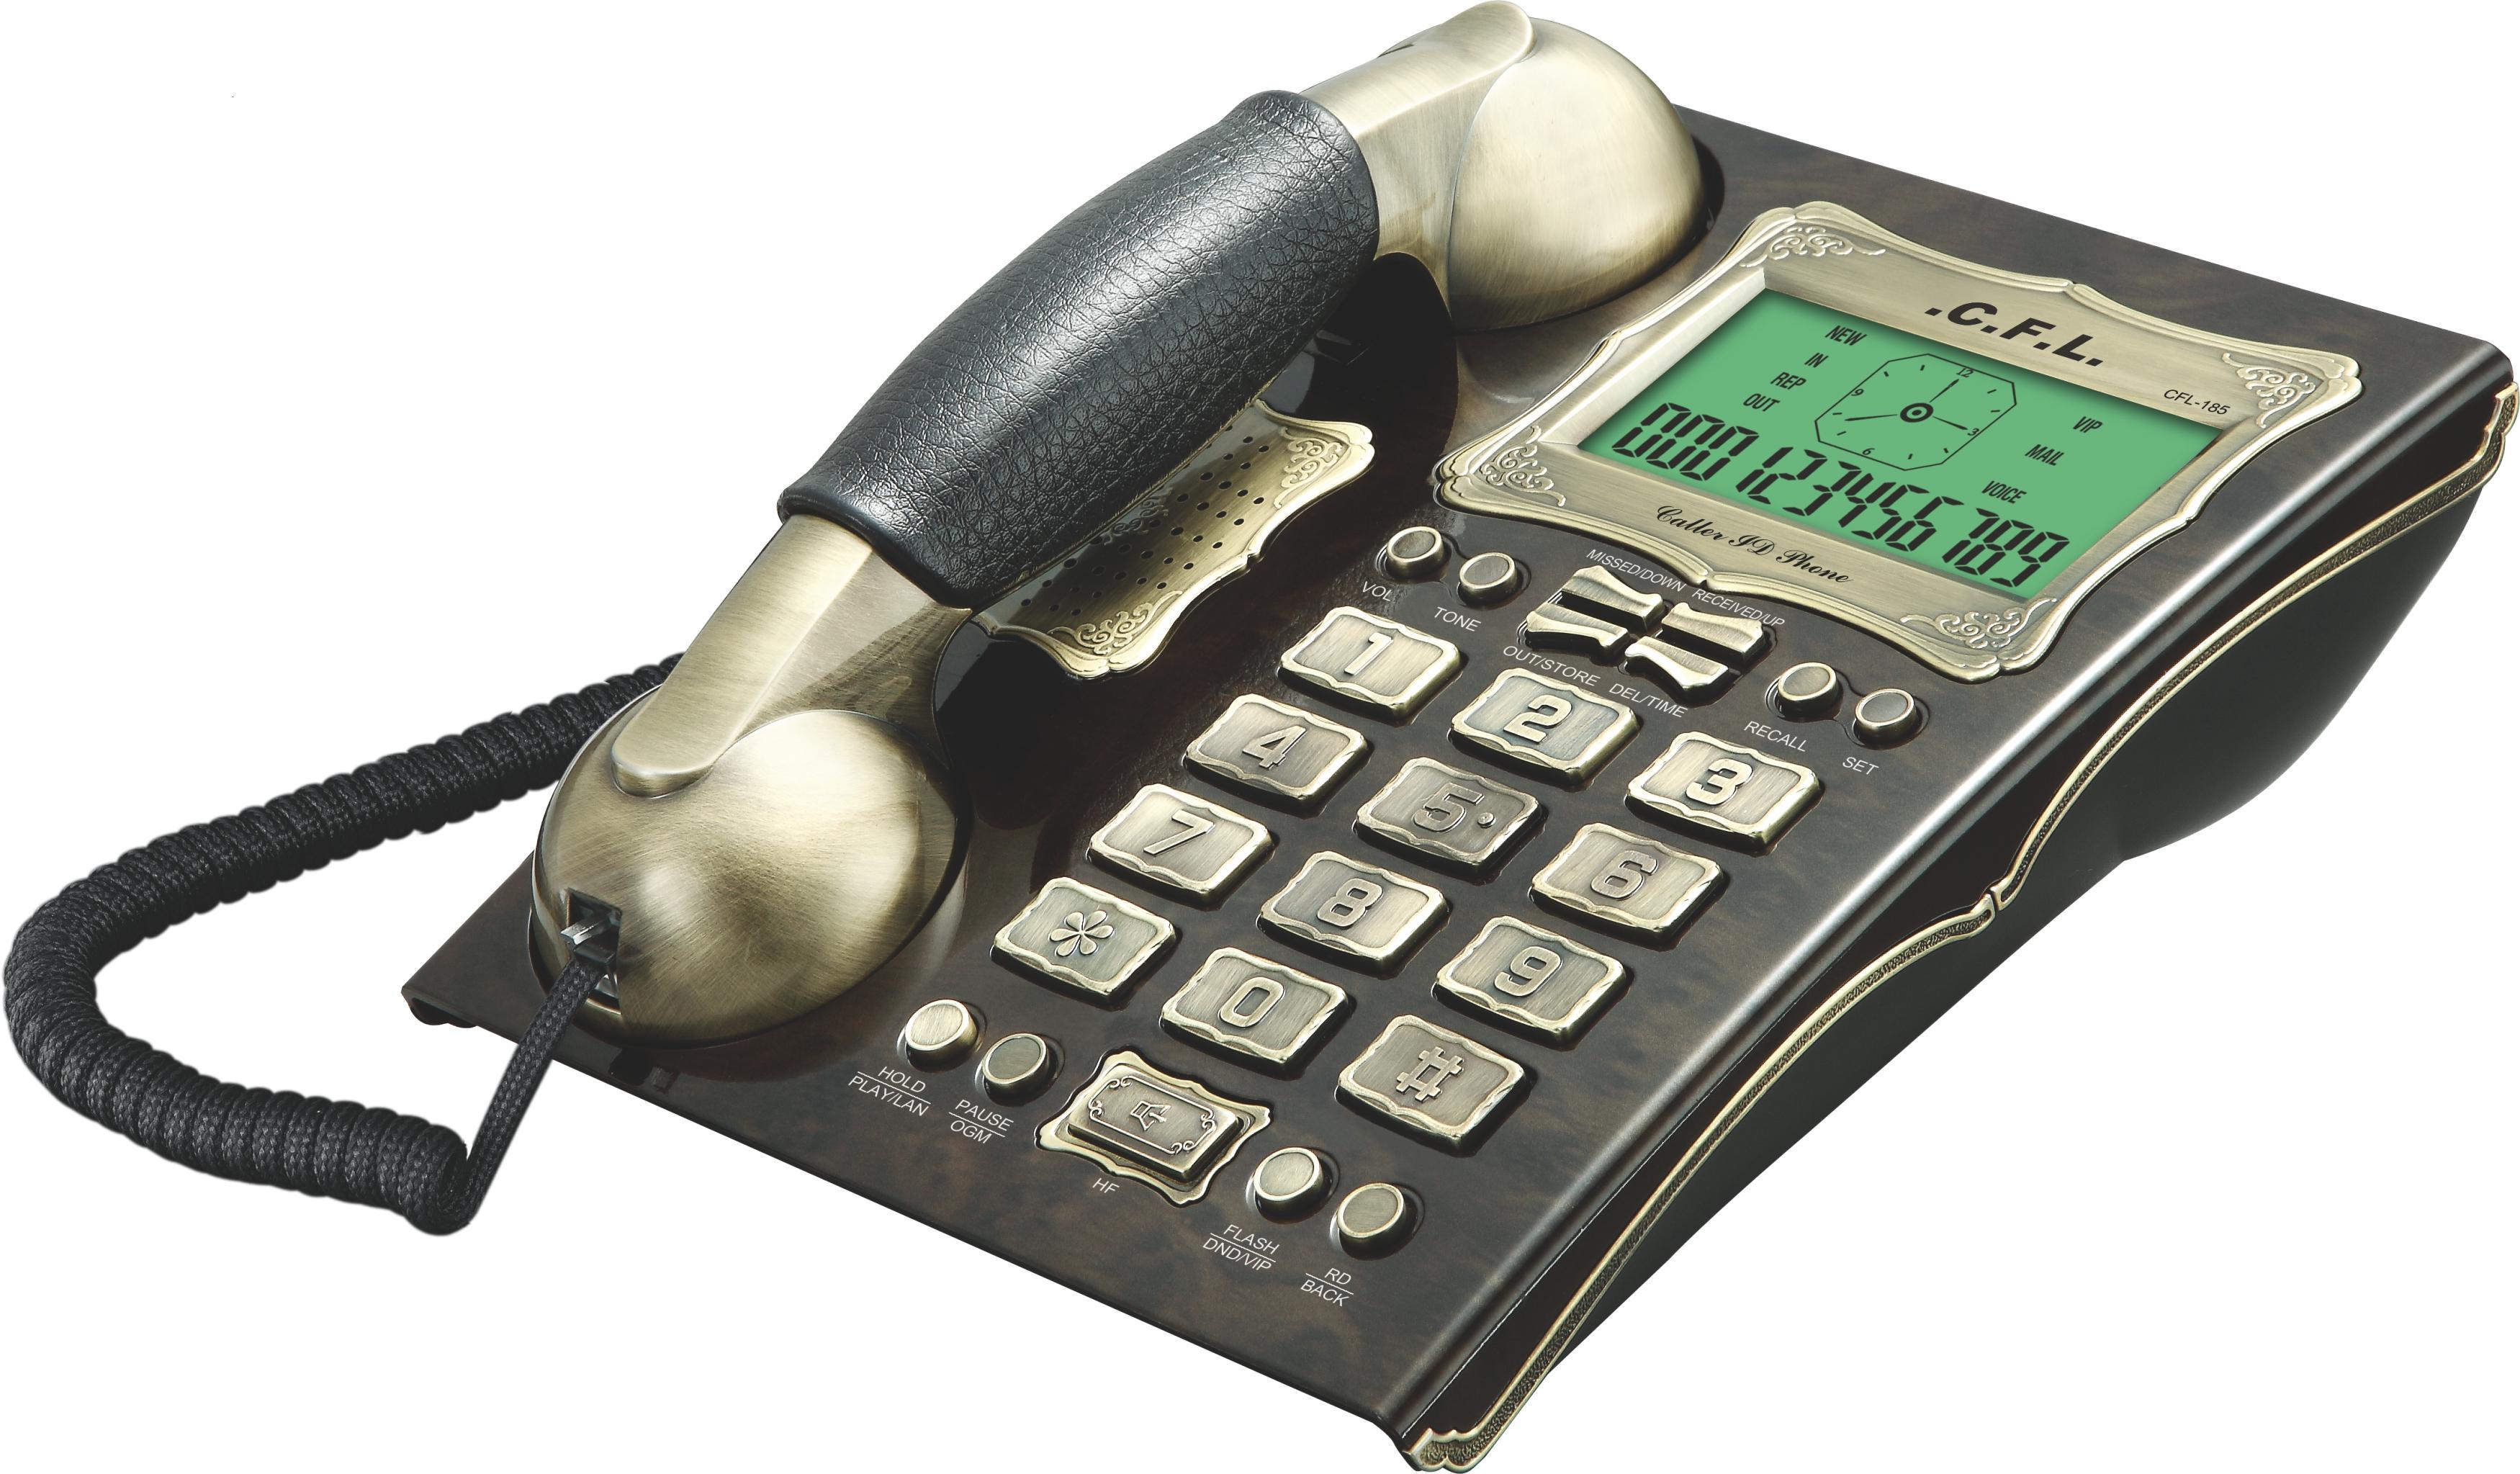 تلفن سی اف ال مدل 185